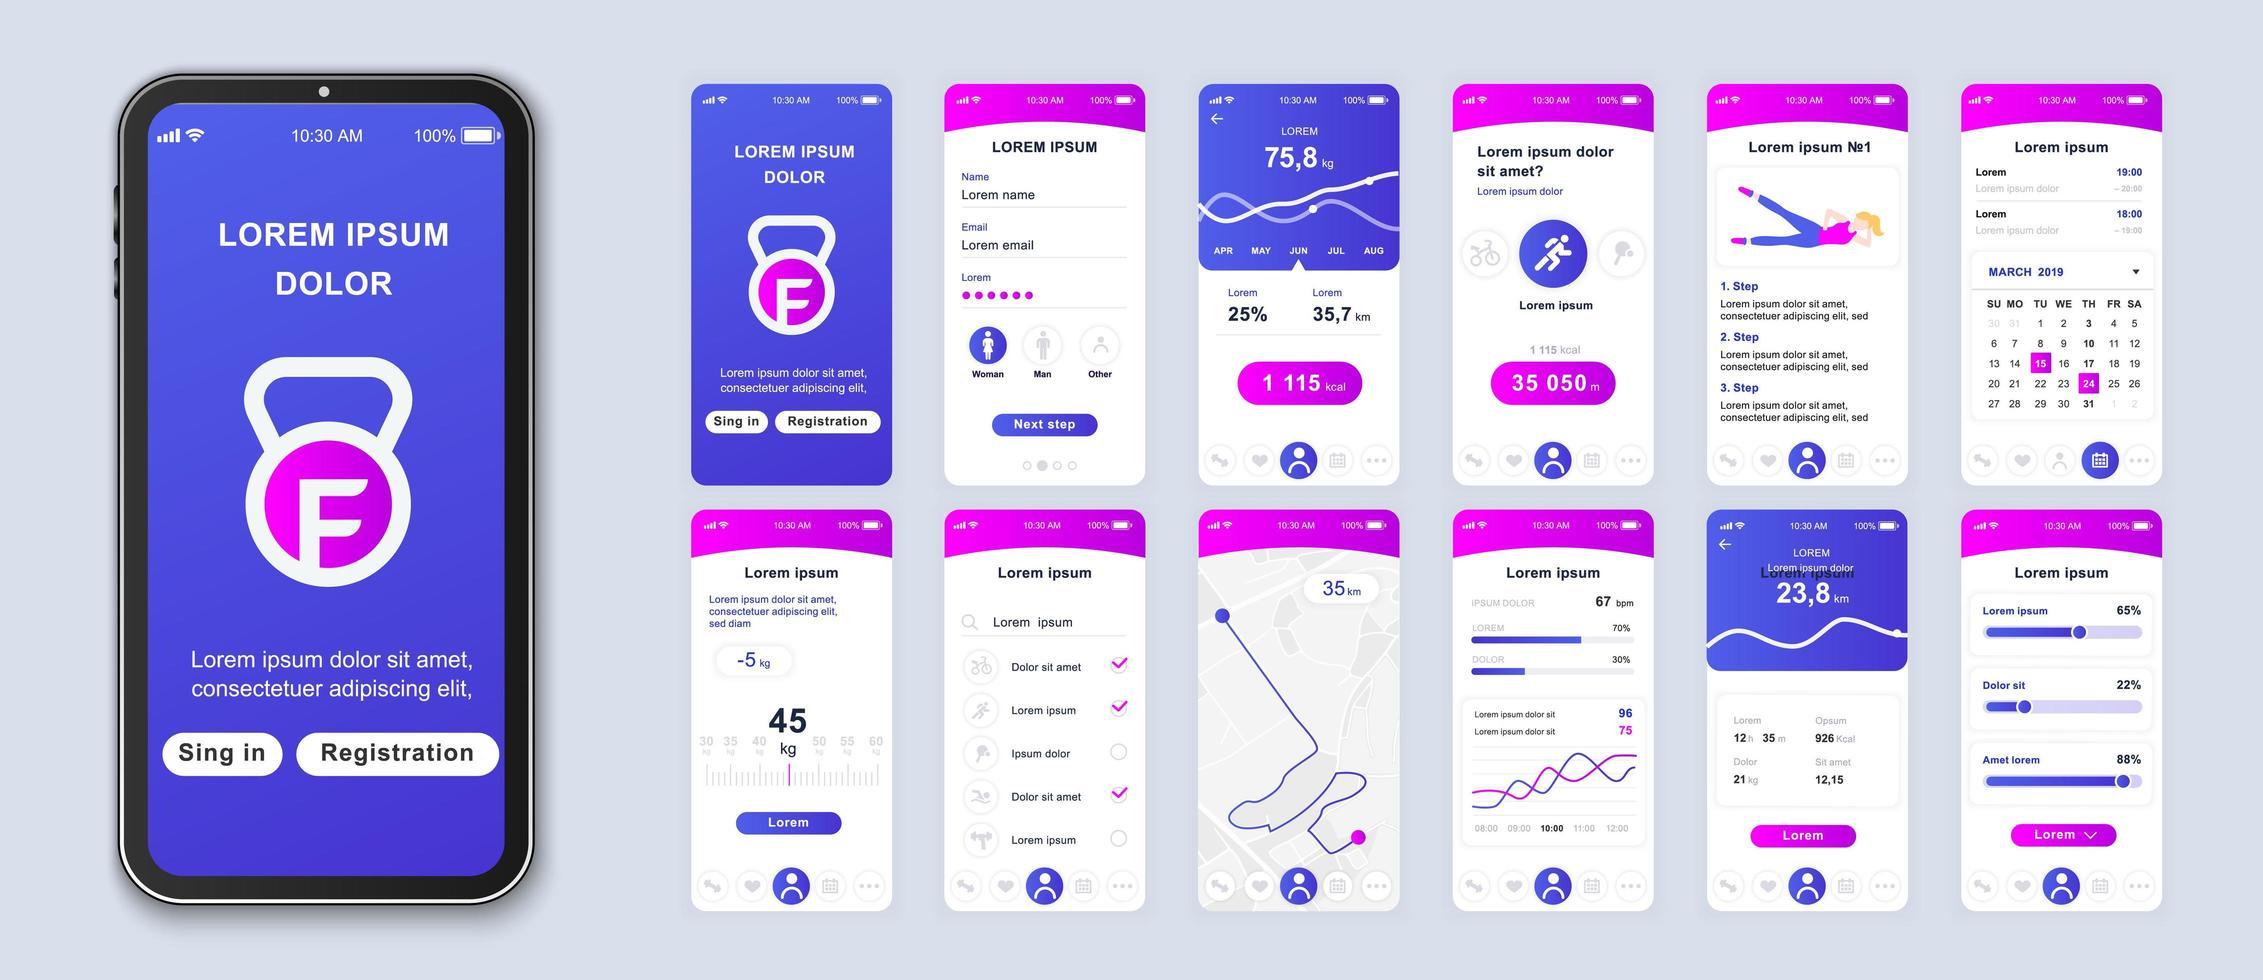 lila und rosa Farbverlauf Fitness UI-Anwendung Smartphone-Oberfläche vektor